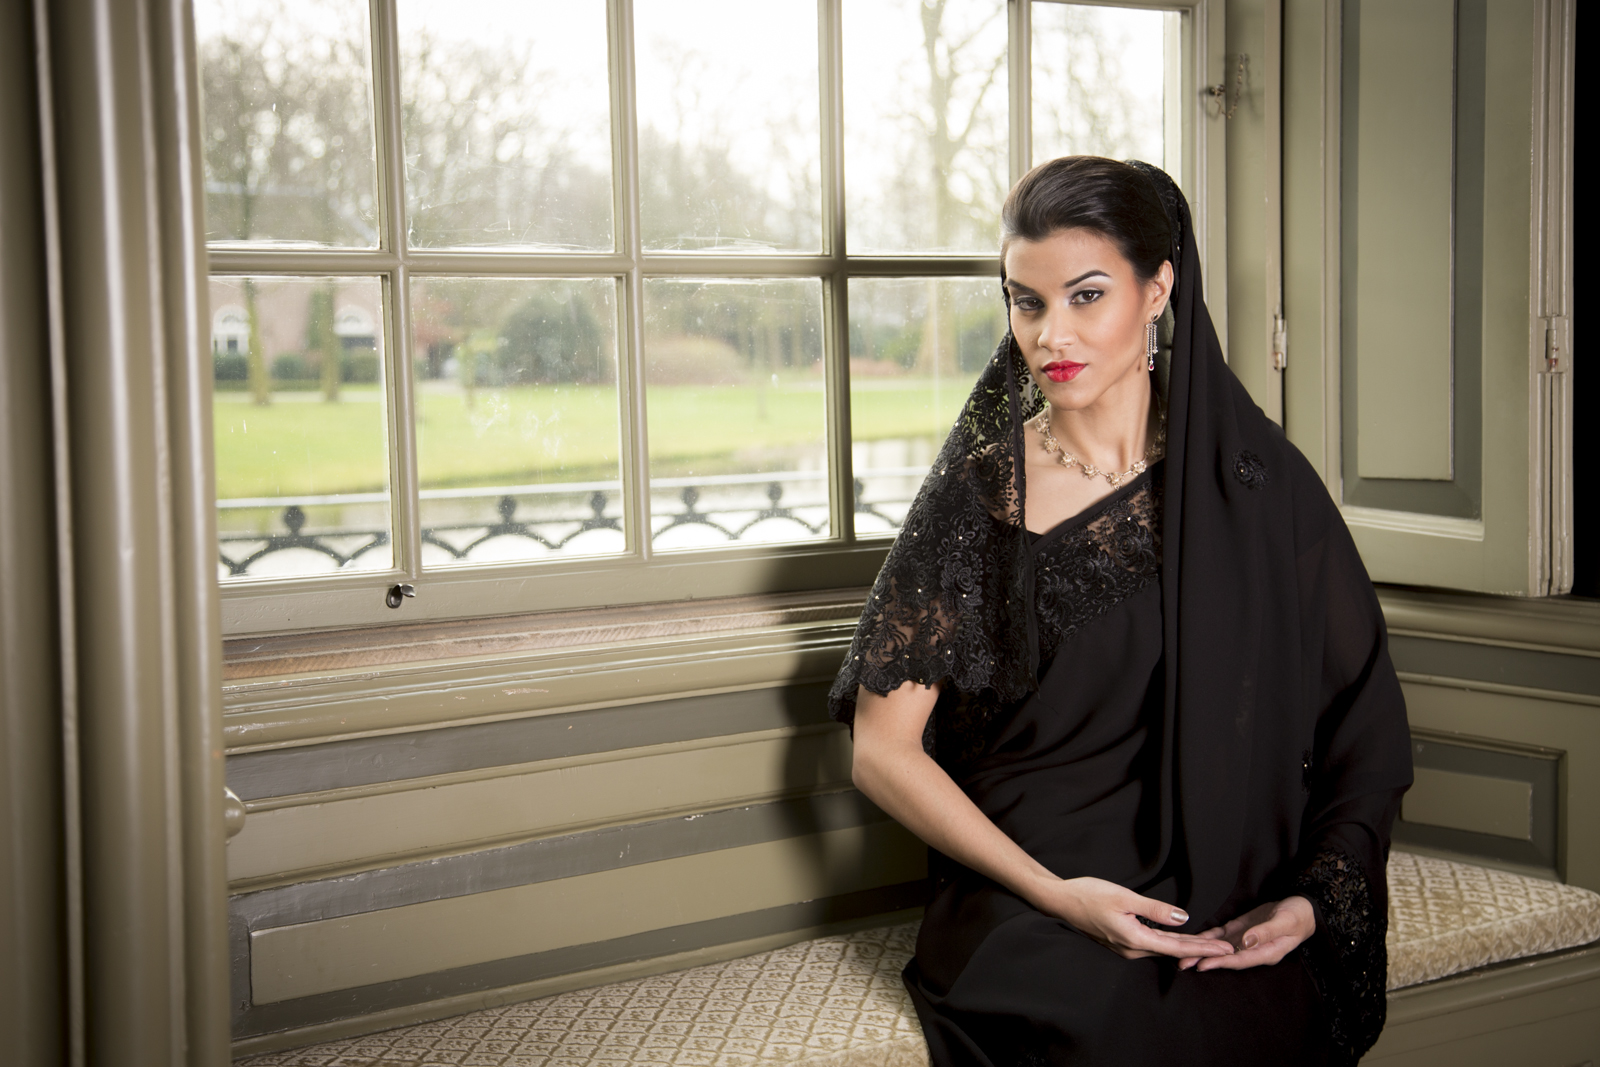 Soraya - The Fashion Orientalist - Photography @ 2014 Roeland Topée | ZinneBeelden